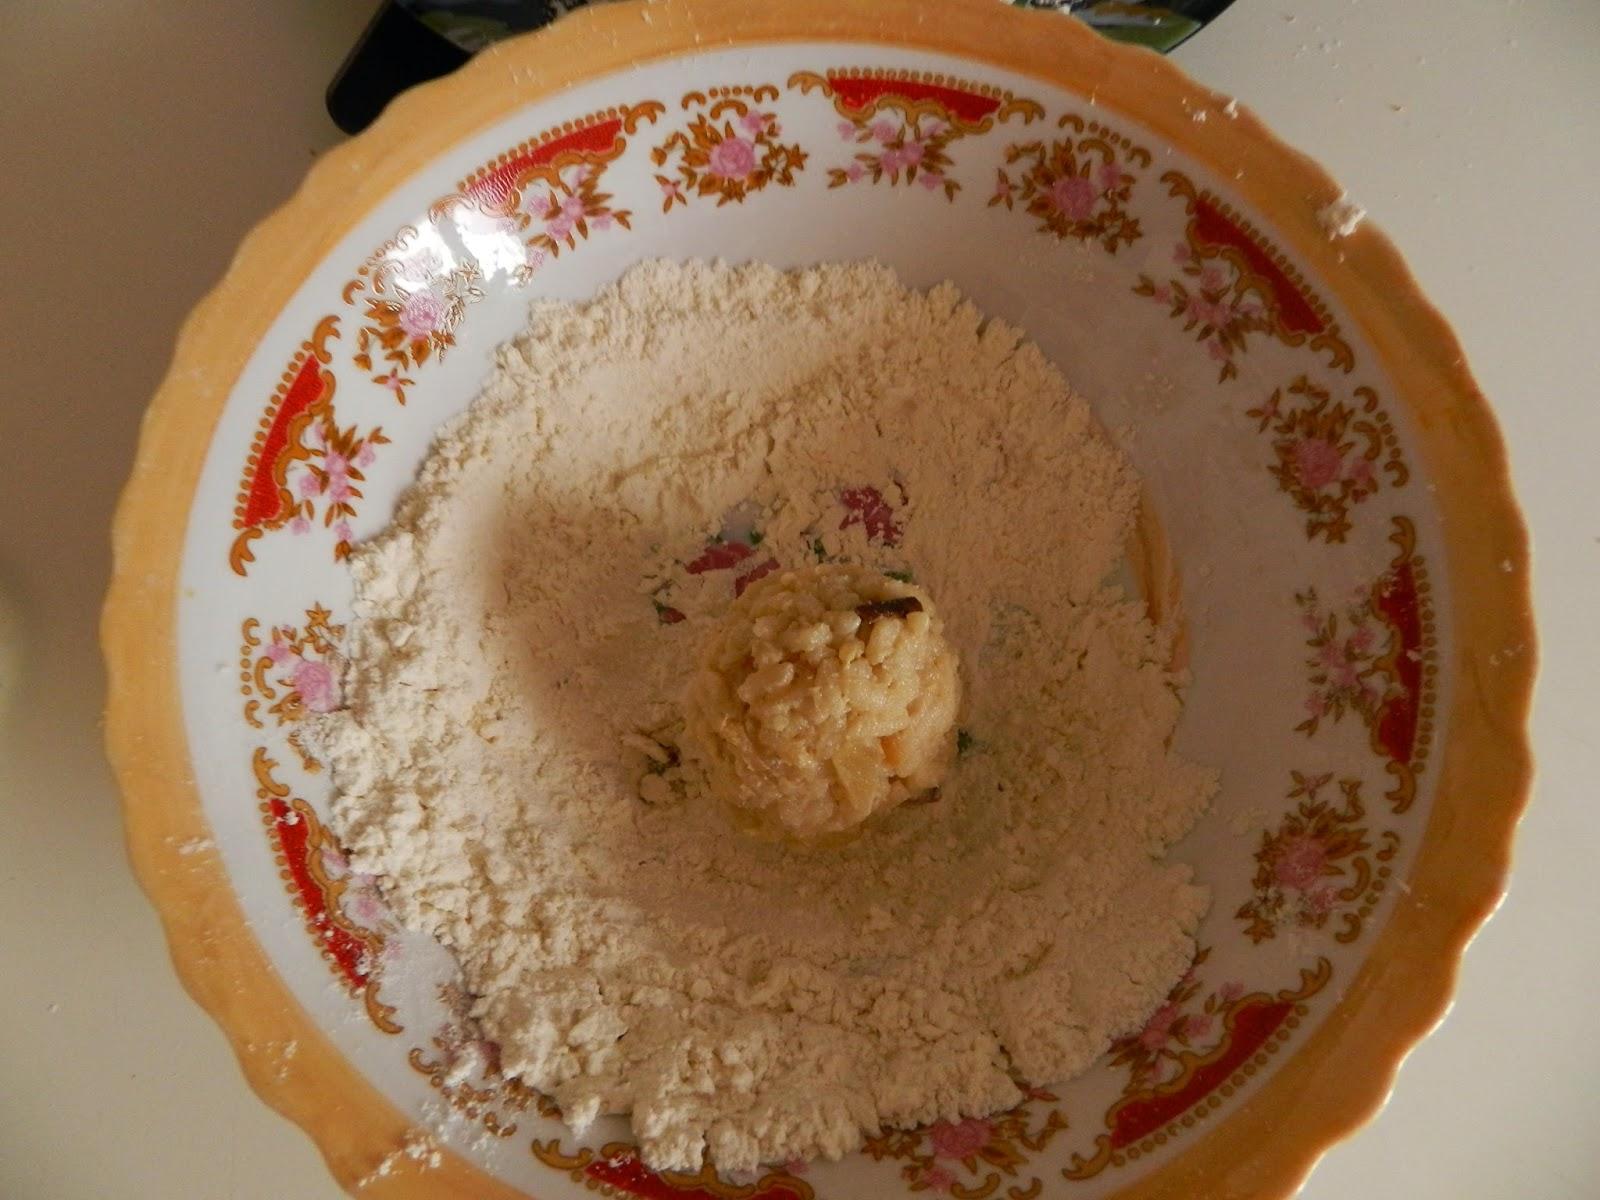 arancini o comment ne pas jeter les restes de risotto let 39 s cook tonight. Black Bedroom Furniture Sets. Home Design Ideas